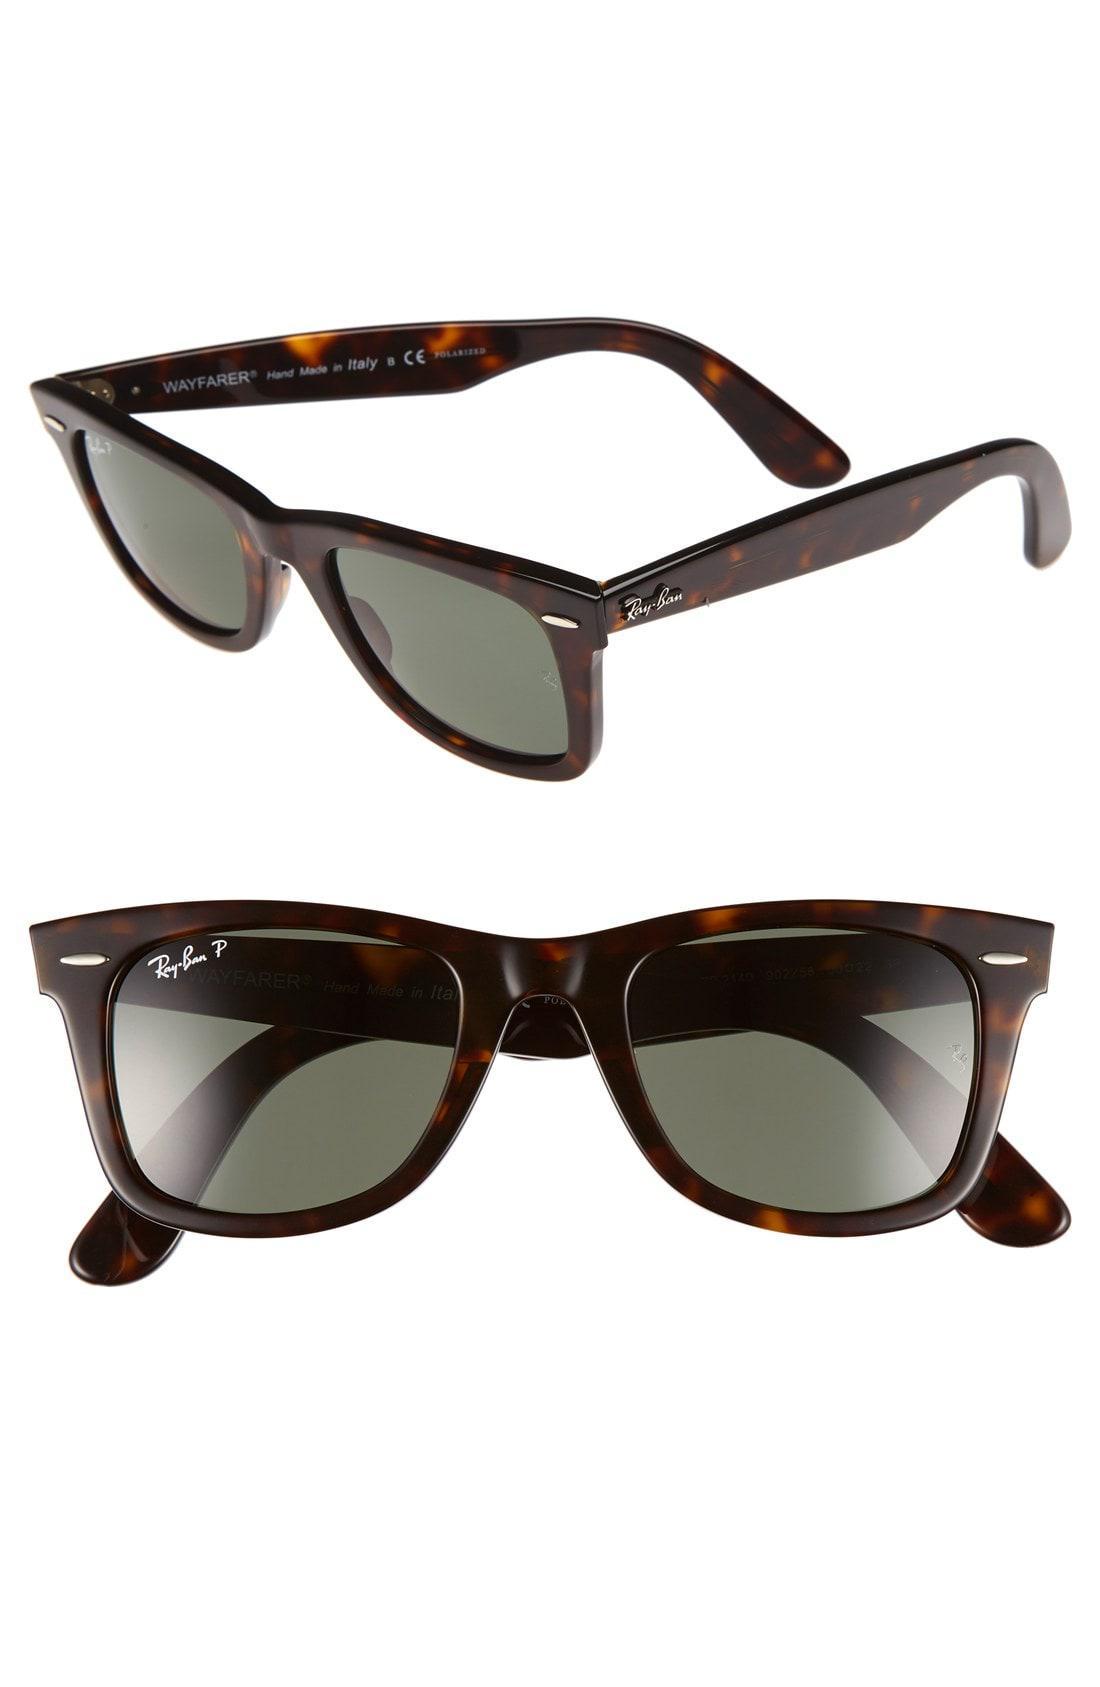 60e8bb34b4 Lyst - Ray-Ban  classic Wayfarer  50mm Polarized Sunglasses in Green ...